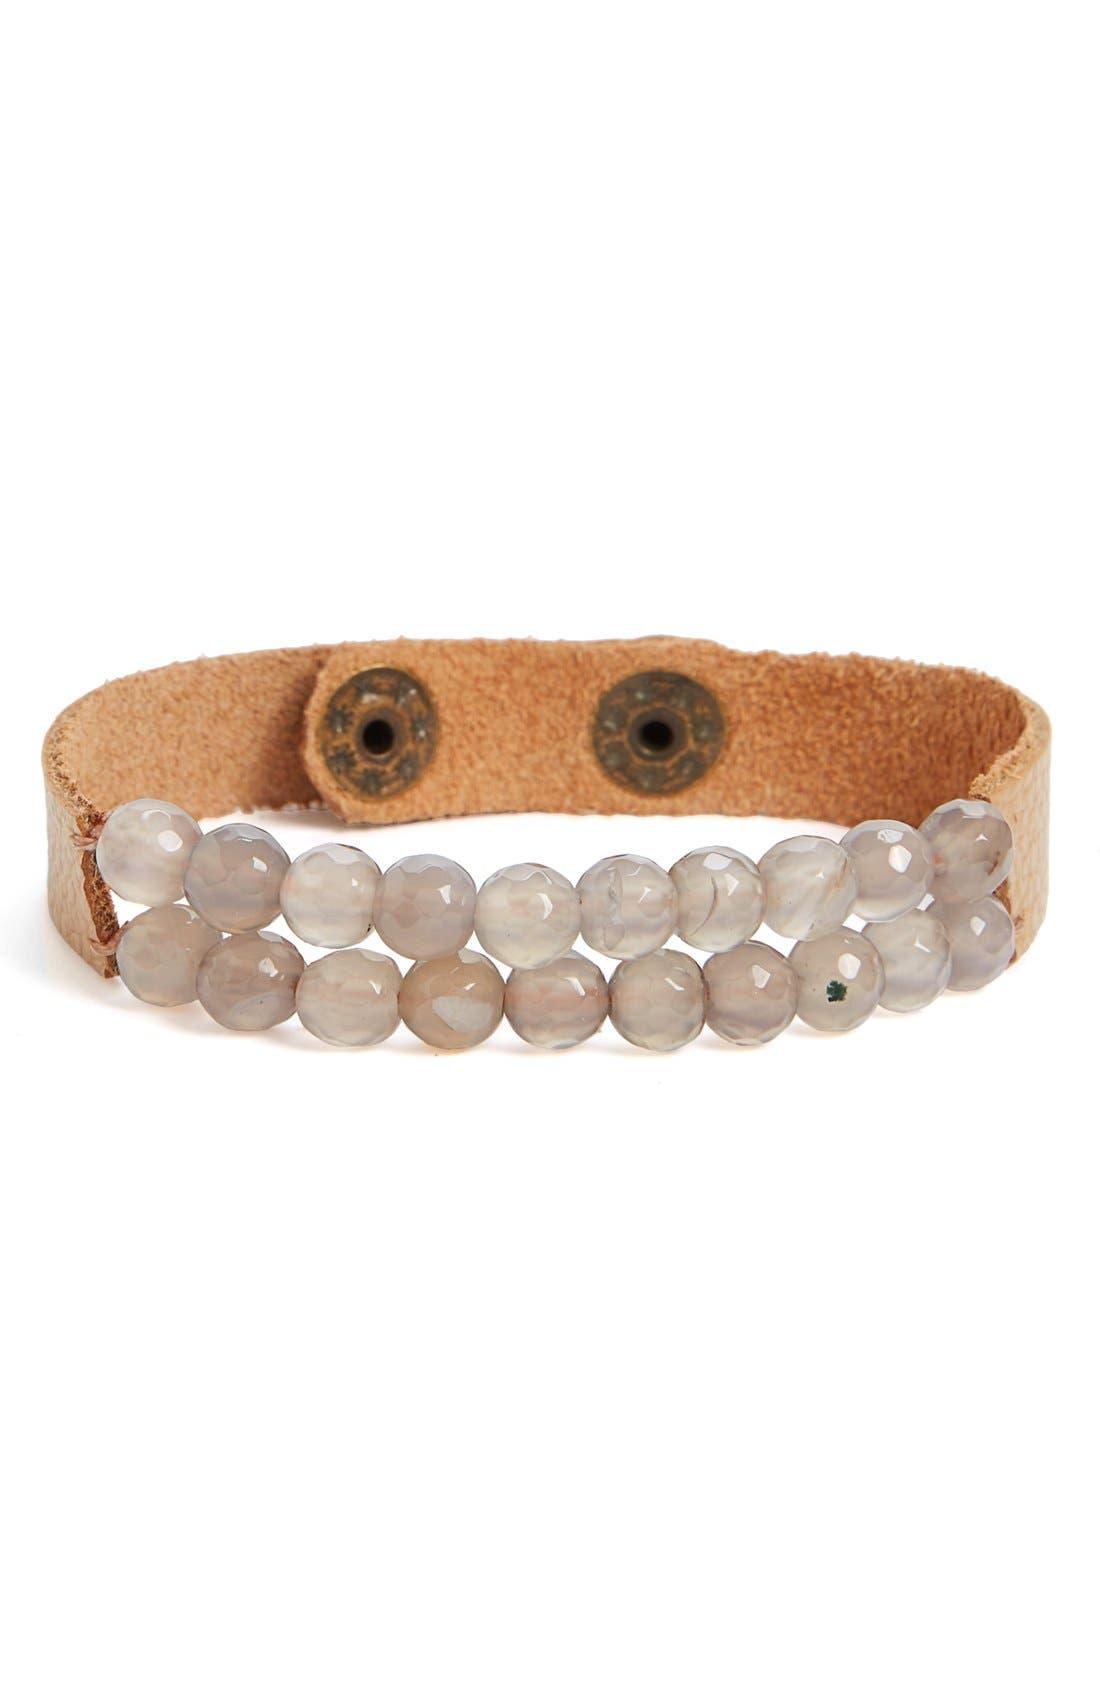 Alternate Image 1 Selected - Panacea Beige Beaded Leather Bracelet